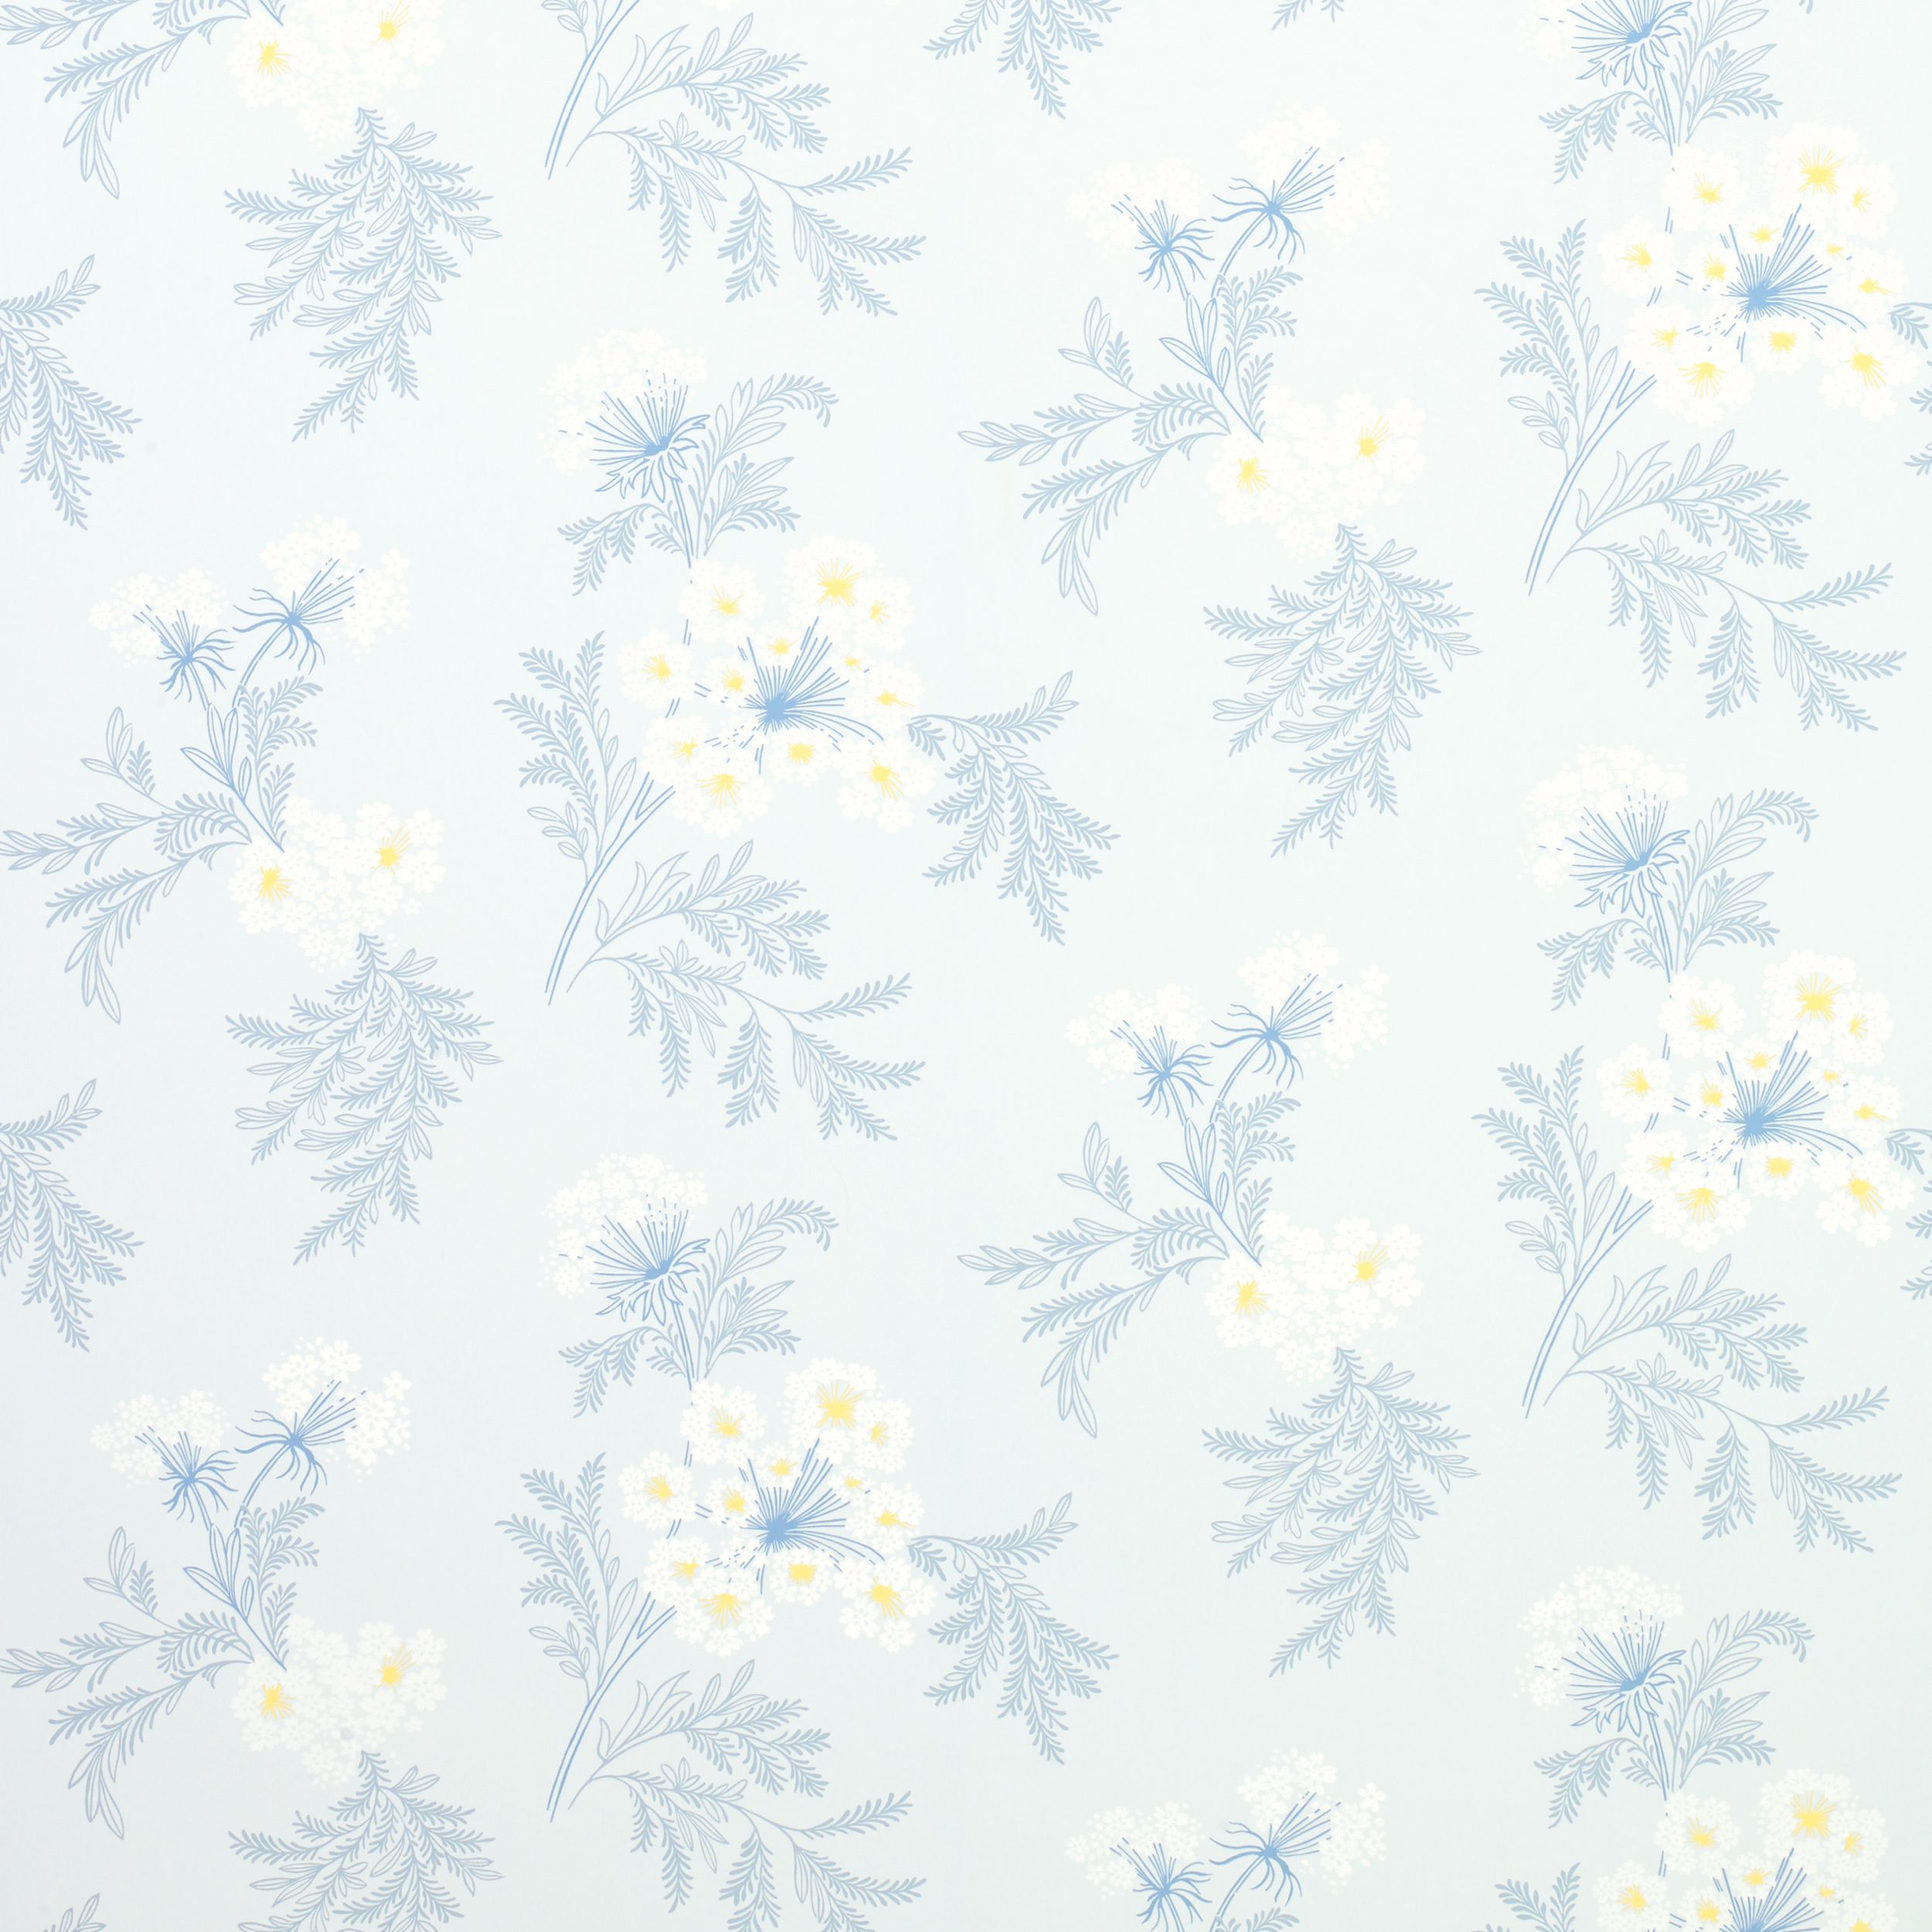 Laura Ashley Kitchen Wallpaper: Laura Ashley Sandford Seaspray Floral Wallpaper